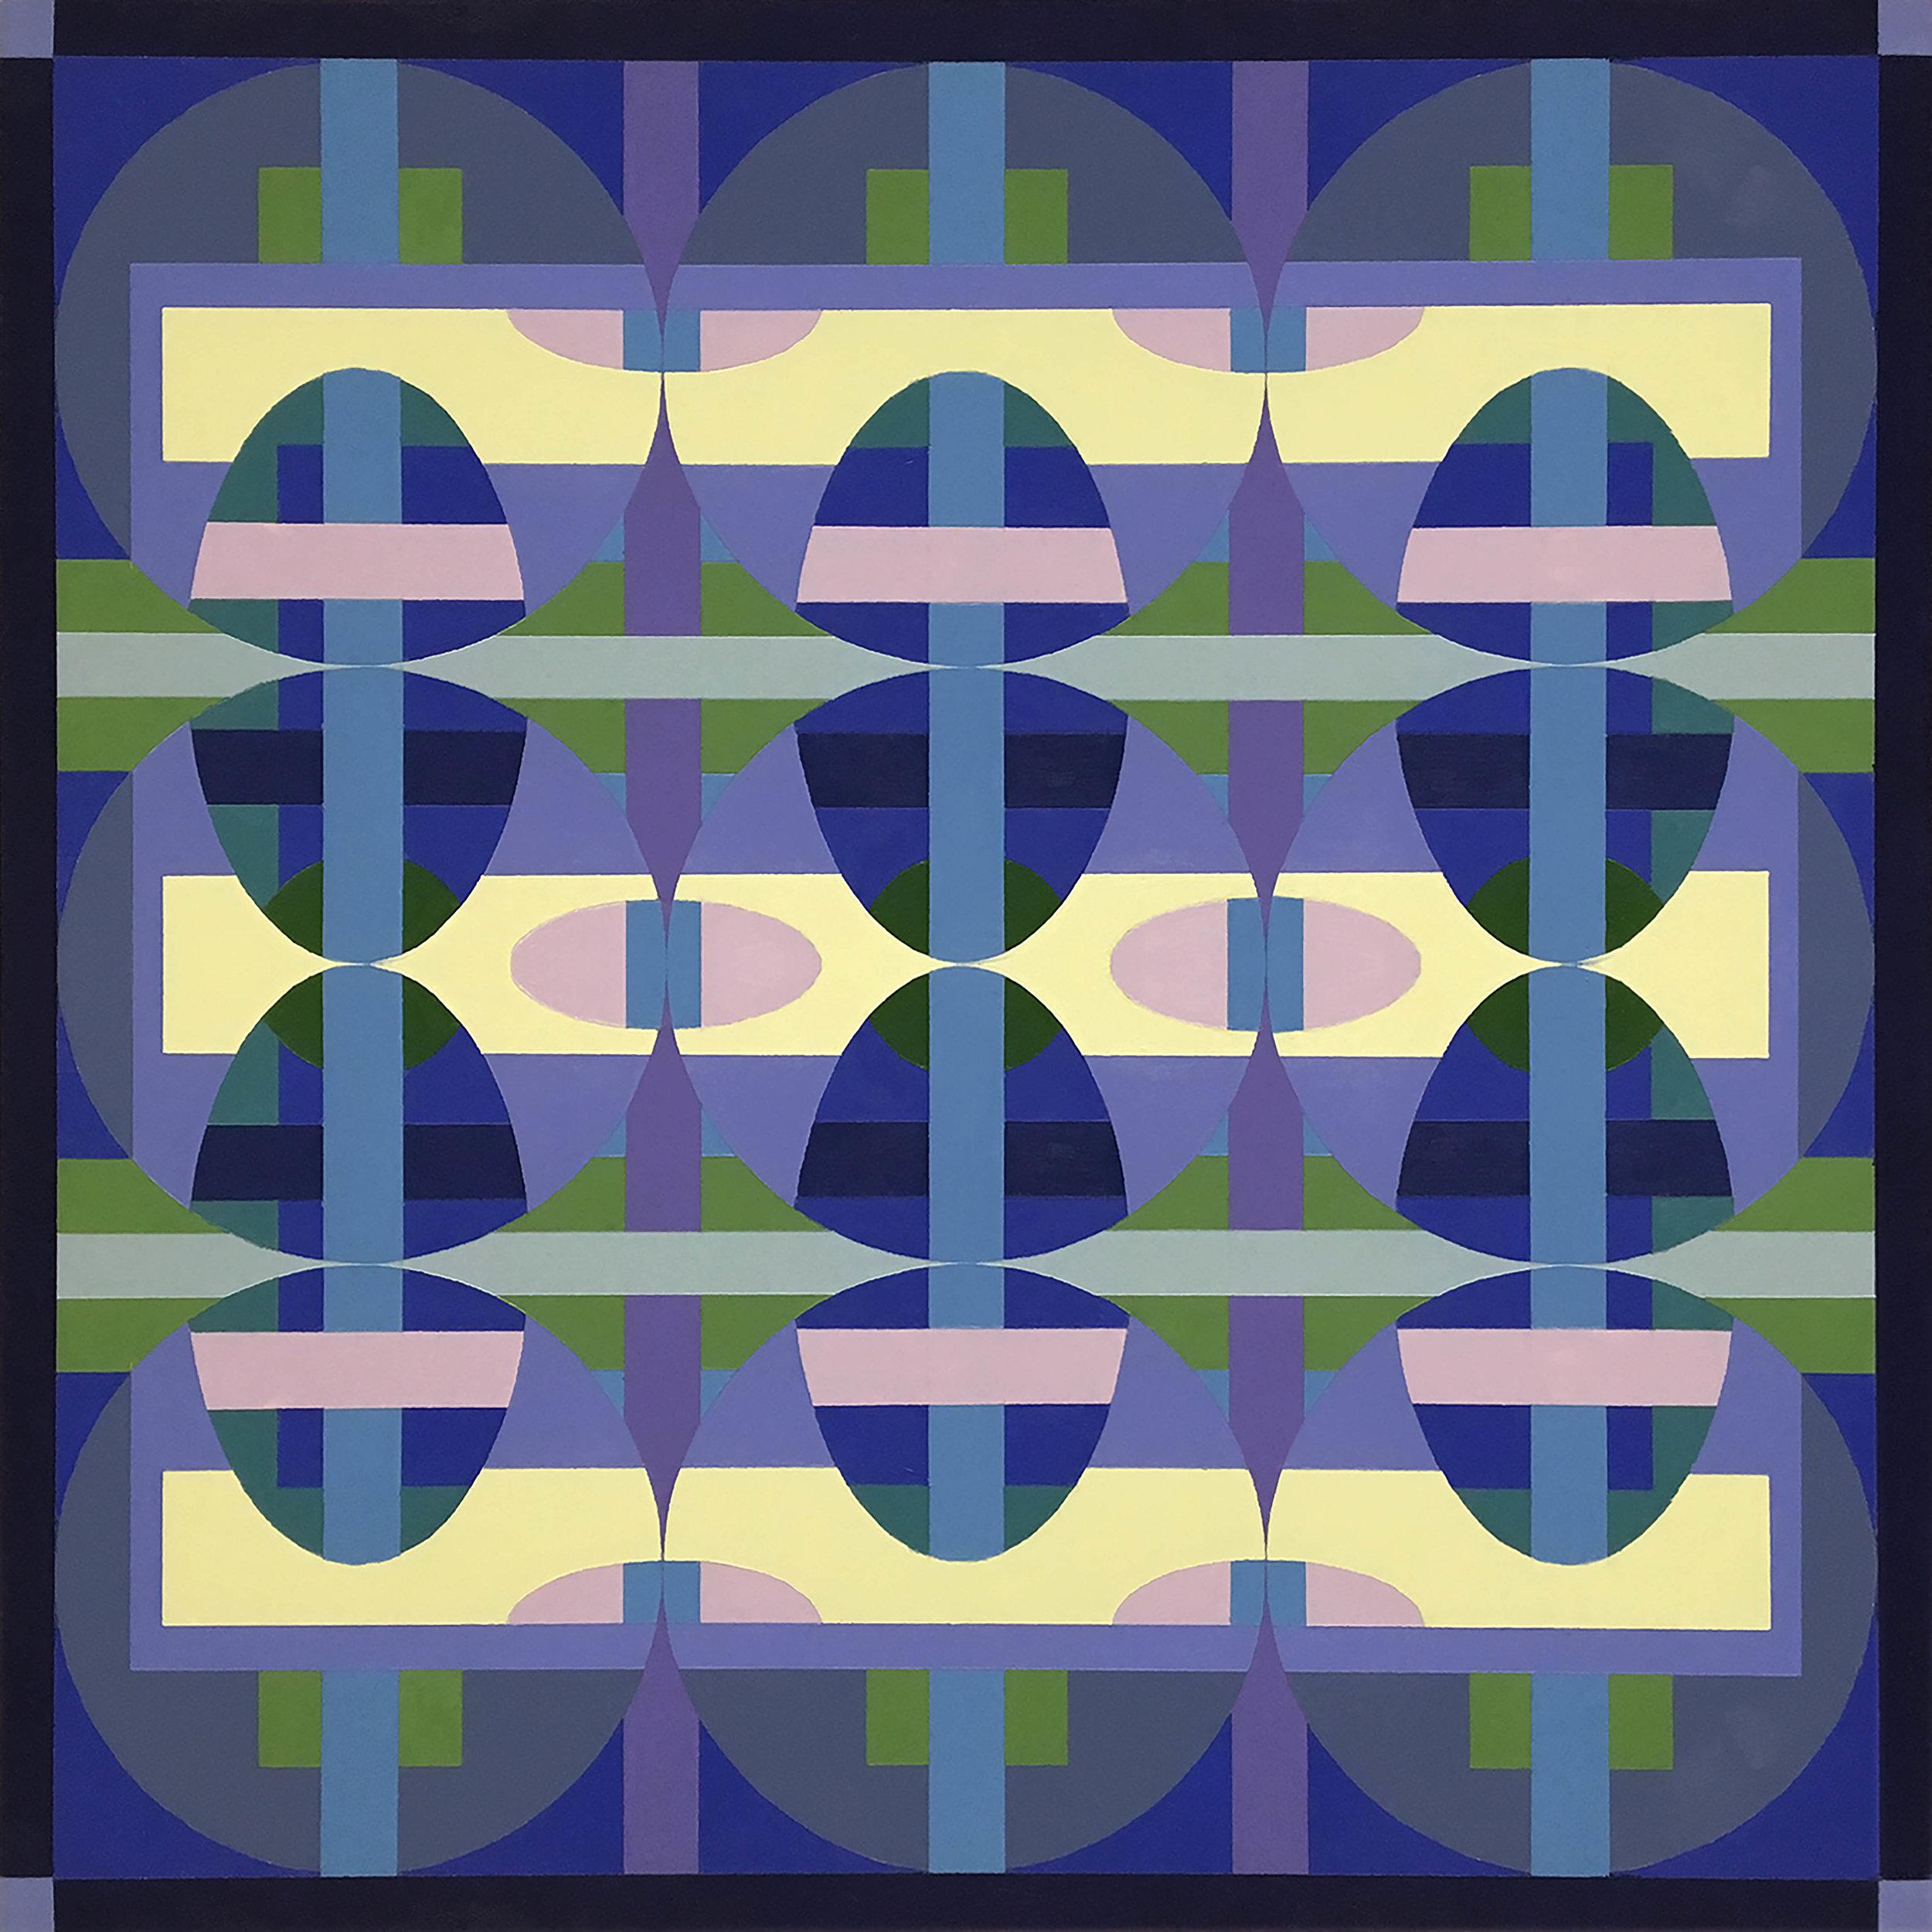 Square Spots 4